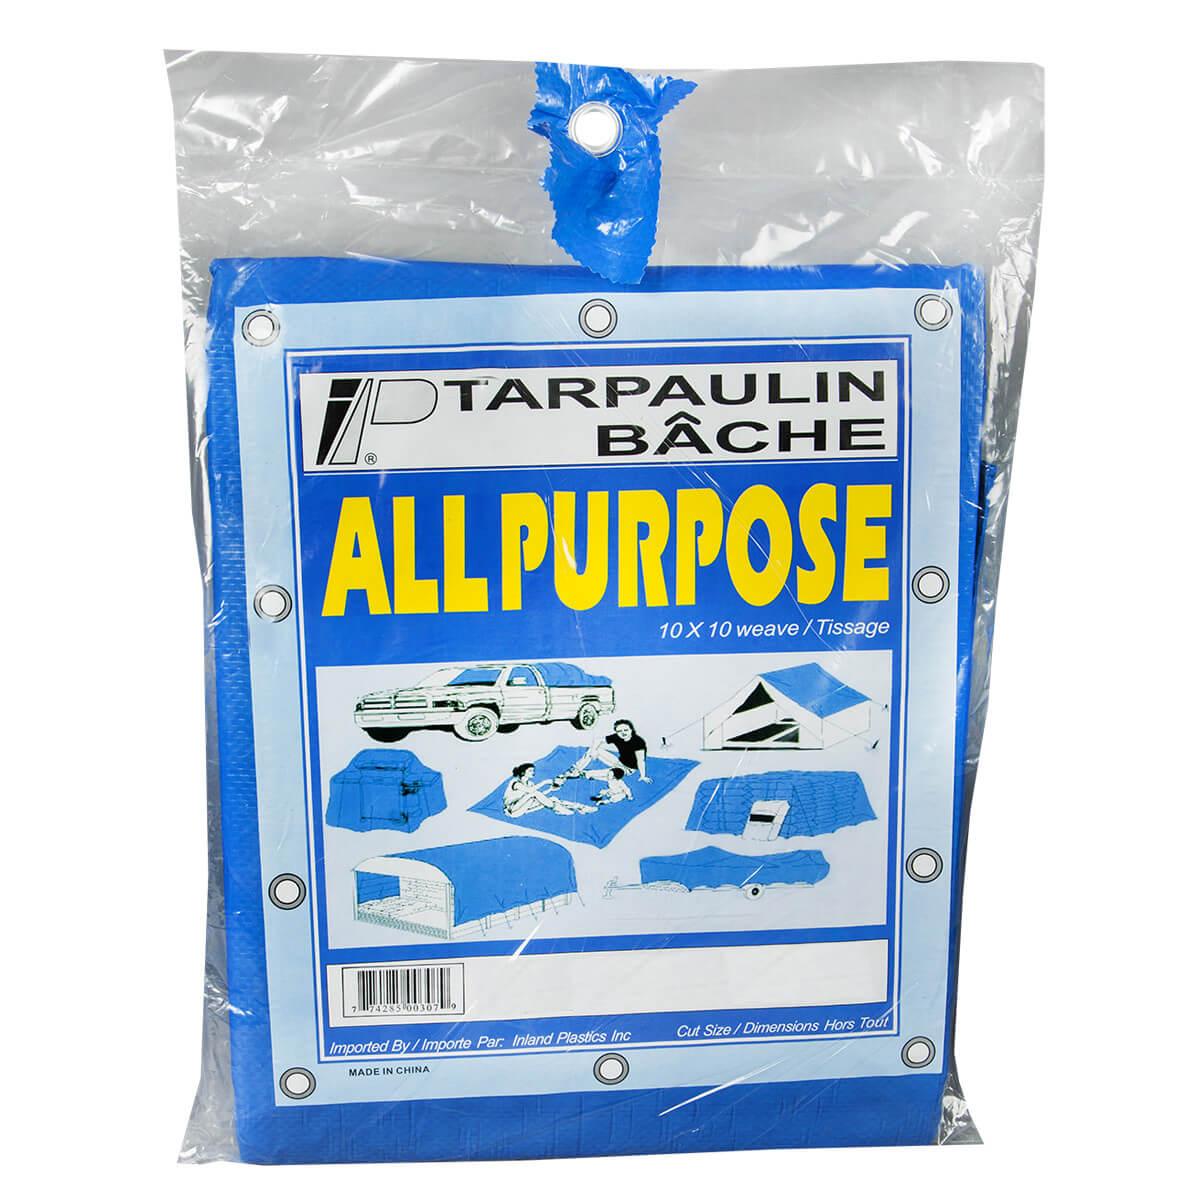 All Purpose Blue Utility Tarps - 12' x 18'